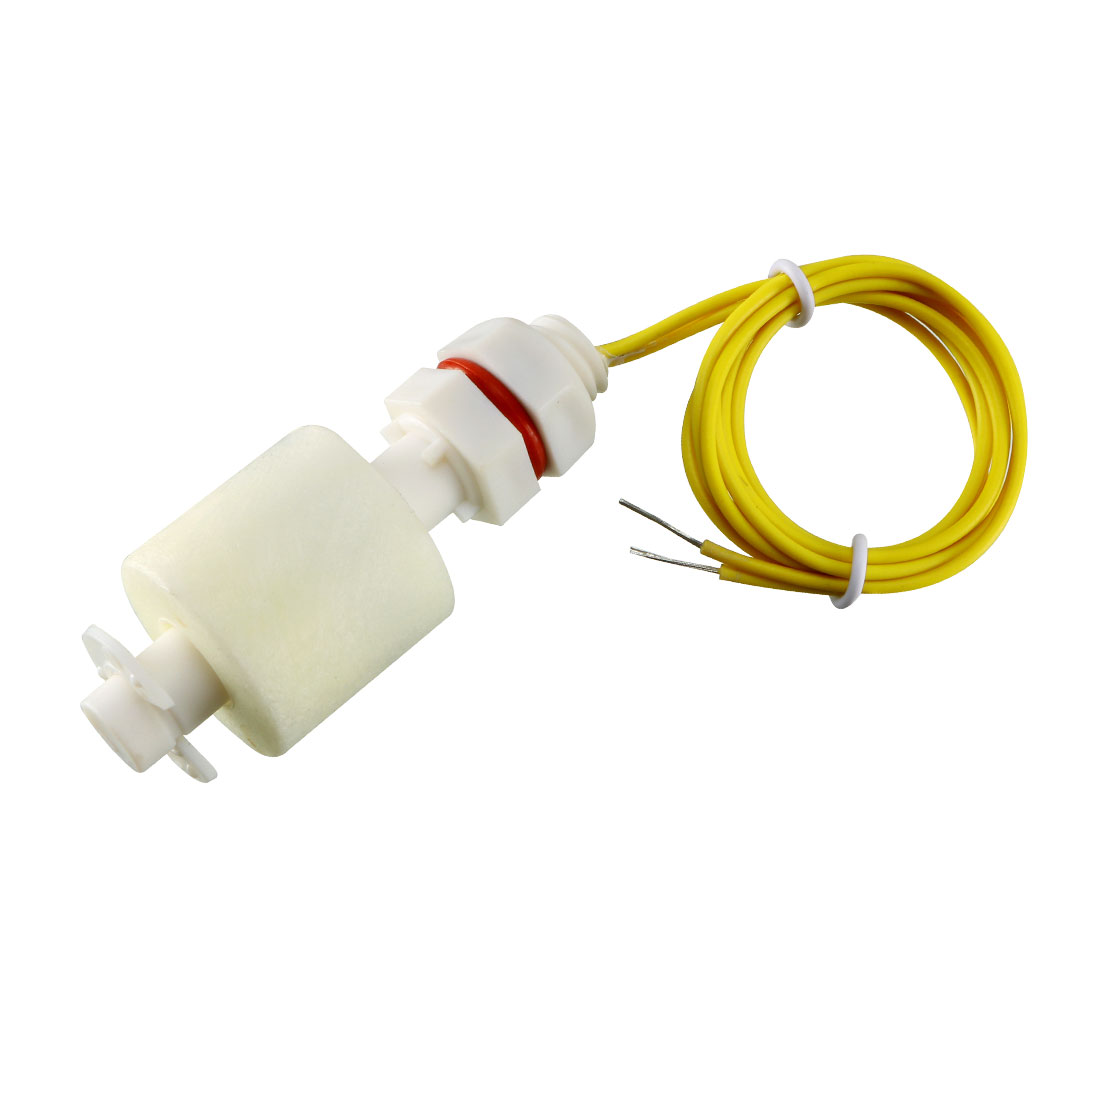 10Pcs Water Level Sensor Vertical Float Switch ZP4510 for Aquarium Pump Control